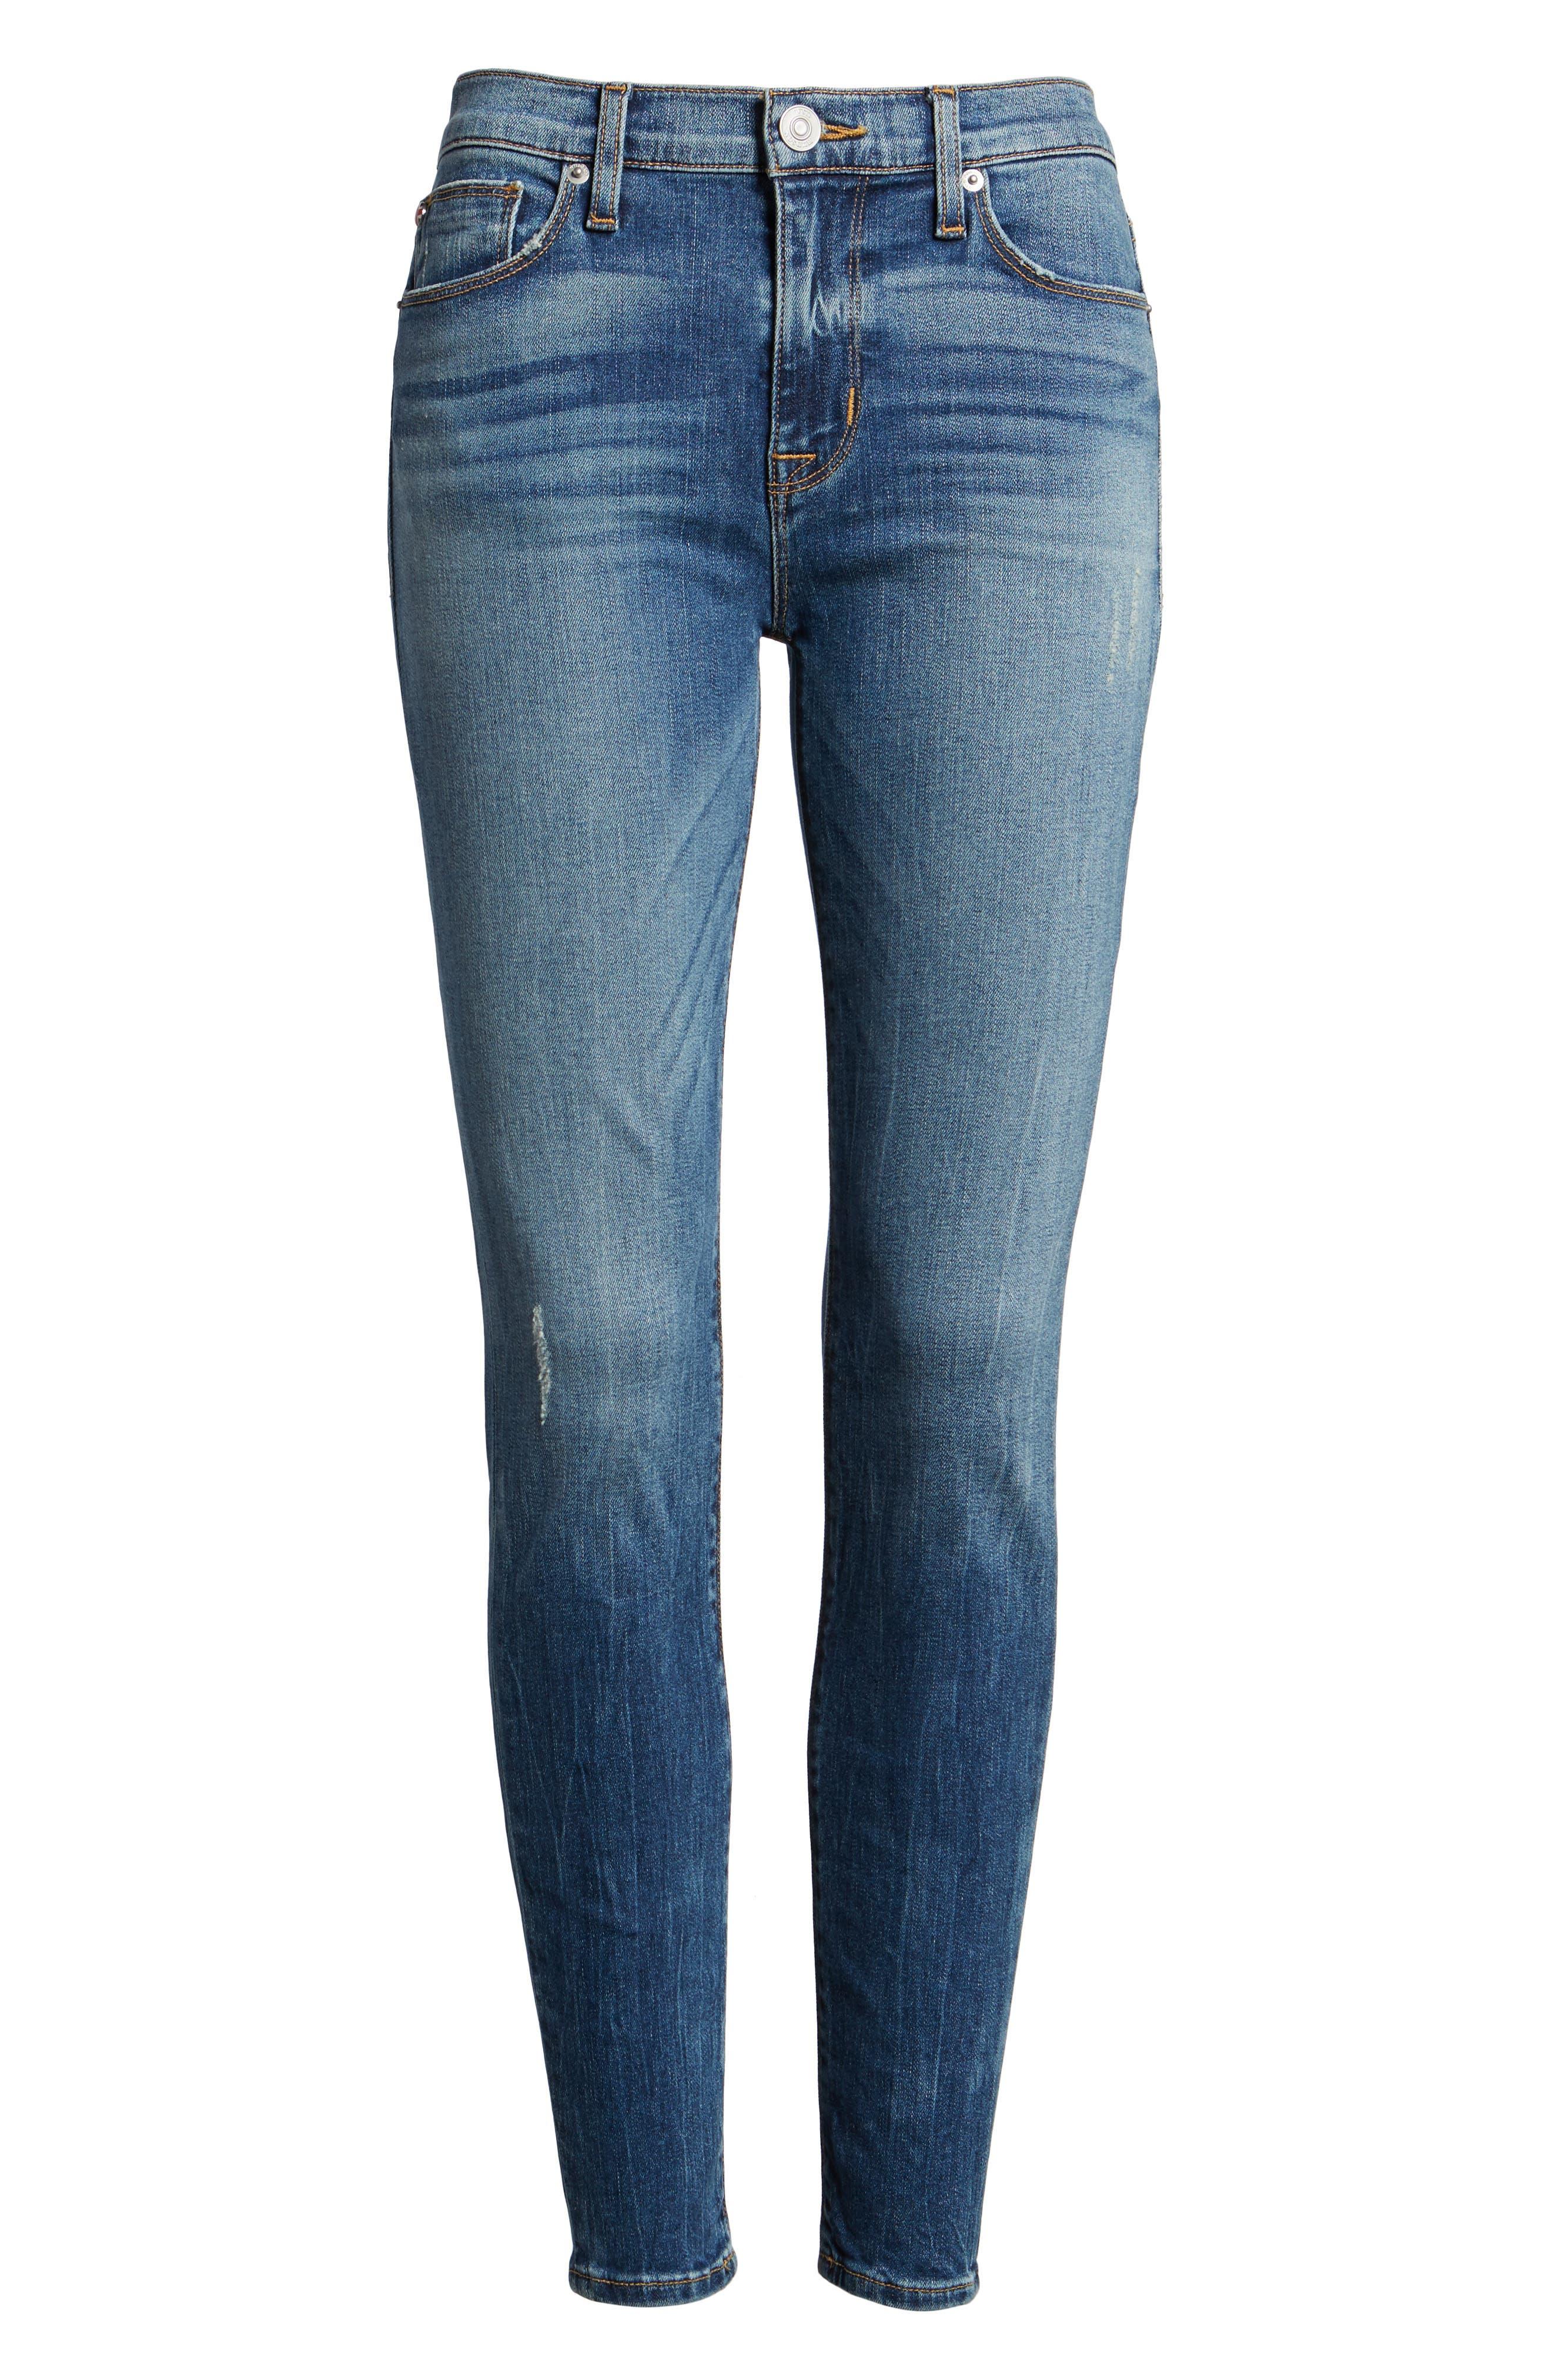 Nico Ankle Super Skinny Jeans,                             Main thumbnail 1, color,                             Lifeline